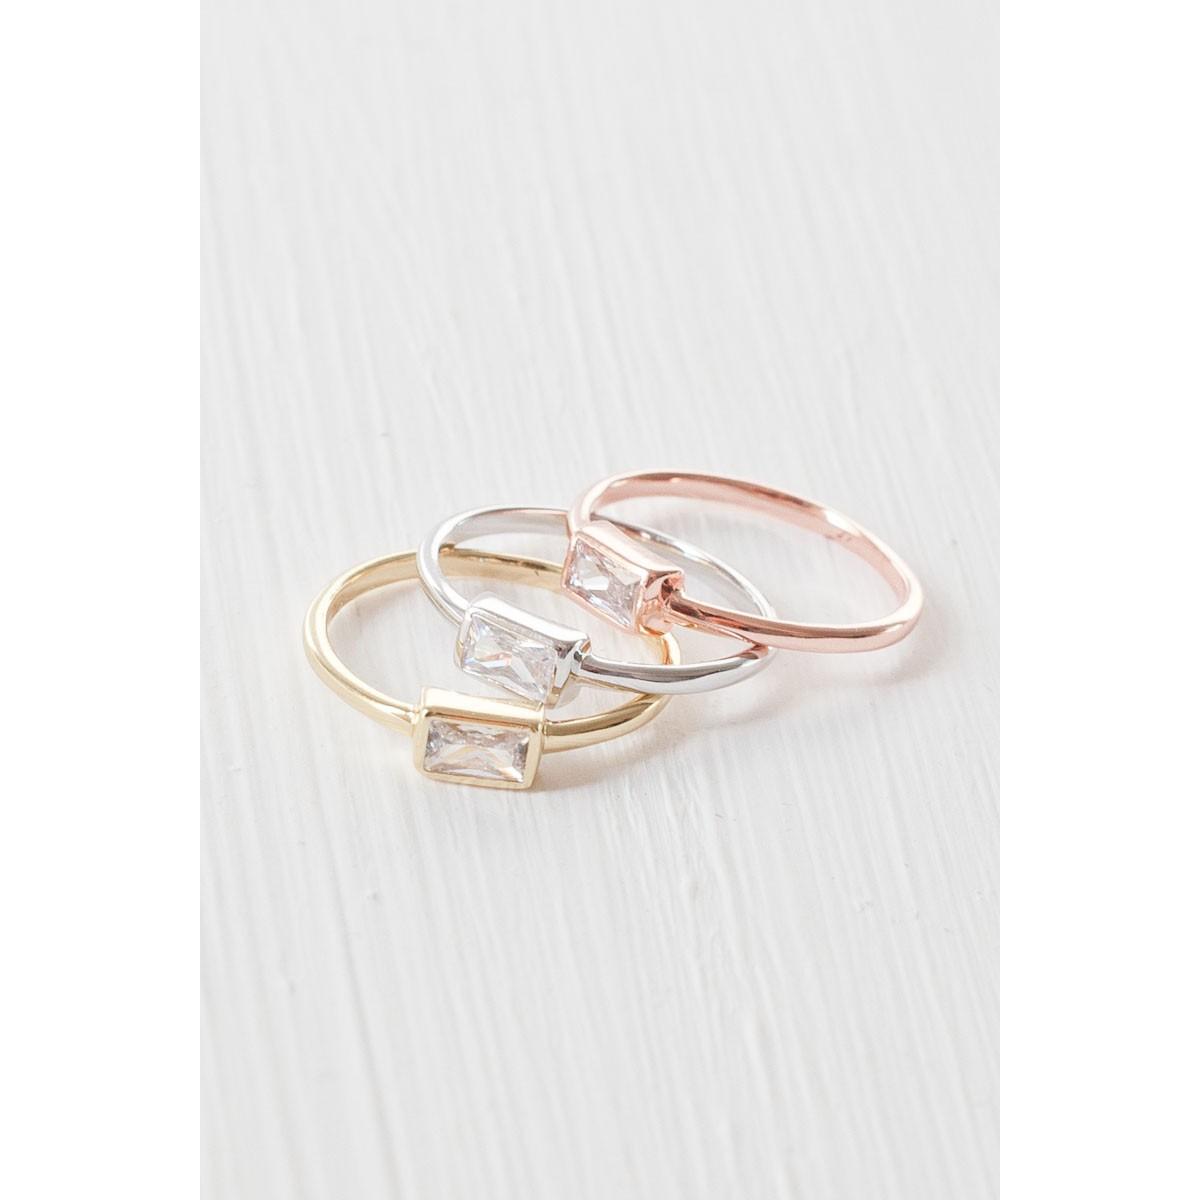 Oh Bracelet Berlin – Baguette Ring aus 925 Sterlingsilber weißvergoldet